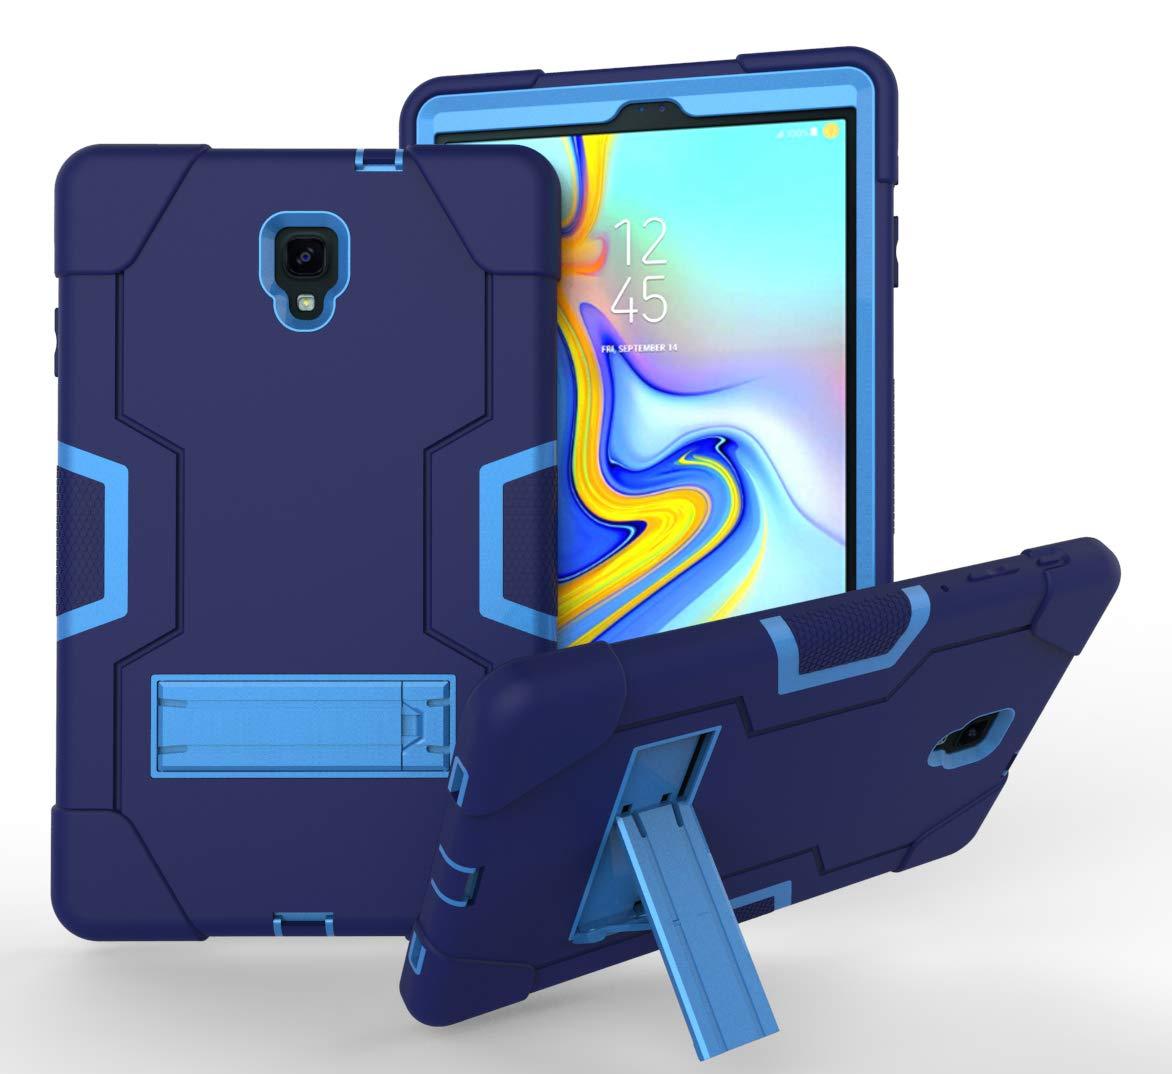 Funda Samsung Galaxy Tab A 10.5 CASEHAVEN [7J1JM9JQ]